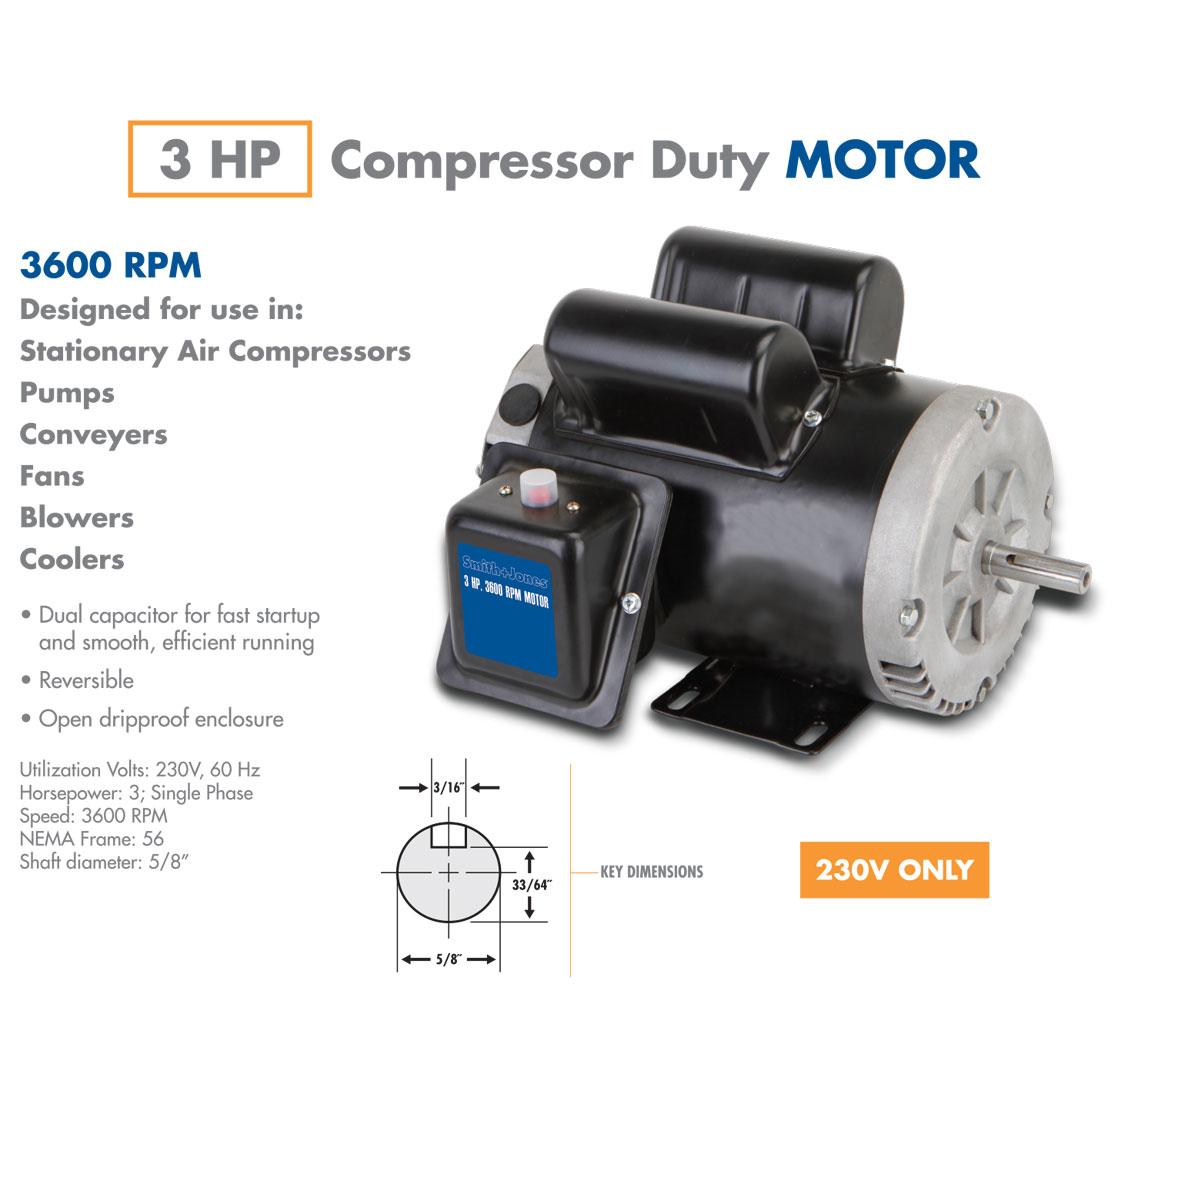 RM_7388] Doerr Compressor Motor Lr22132 Wiring Diagram Free DiagramCran Ilari Viewor Mohammedshrine Librar Wiring 101